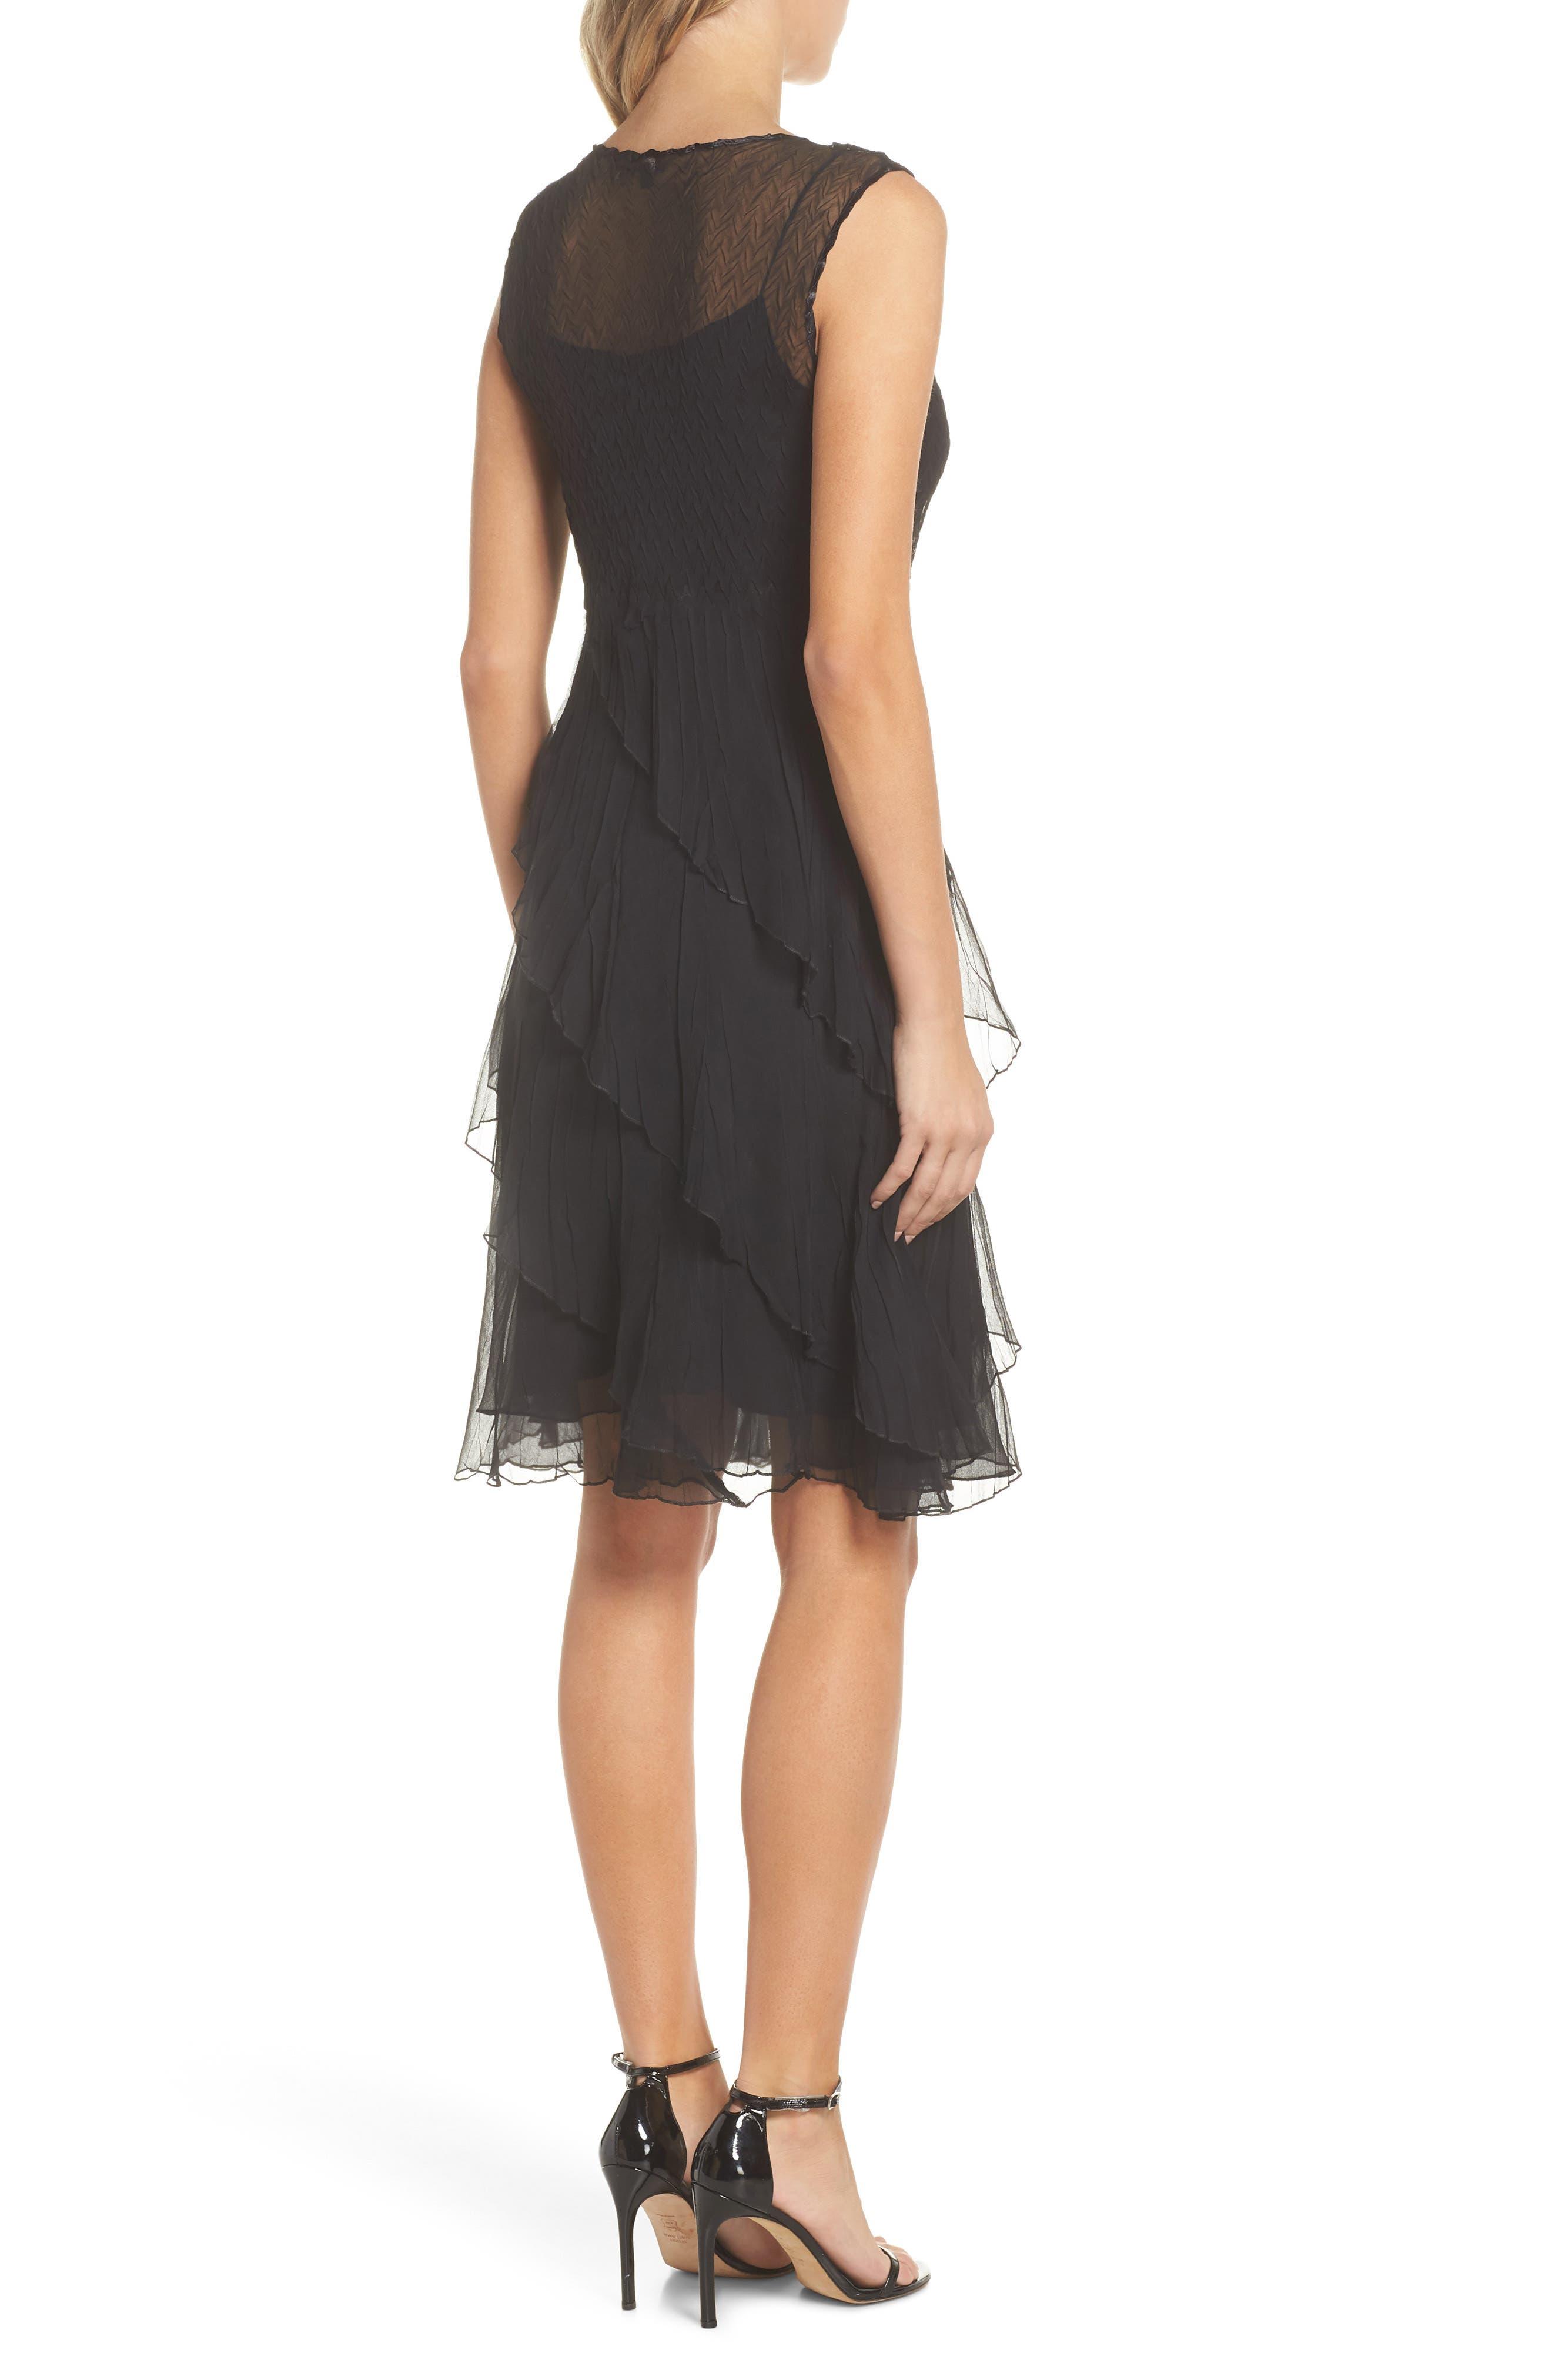 KOMAROV, Bead Trim Chiffon Dress with Wrap, Alternate thumbnail 2, color, BLACK